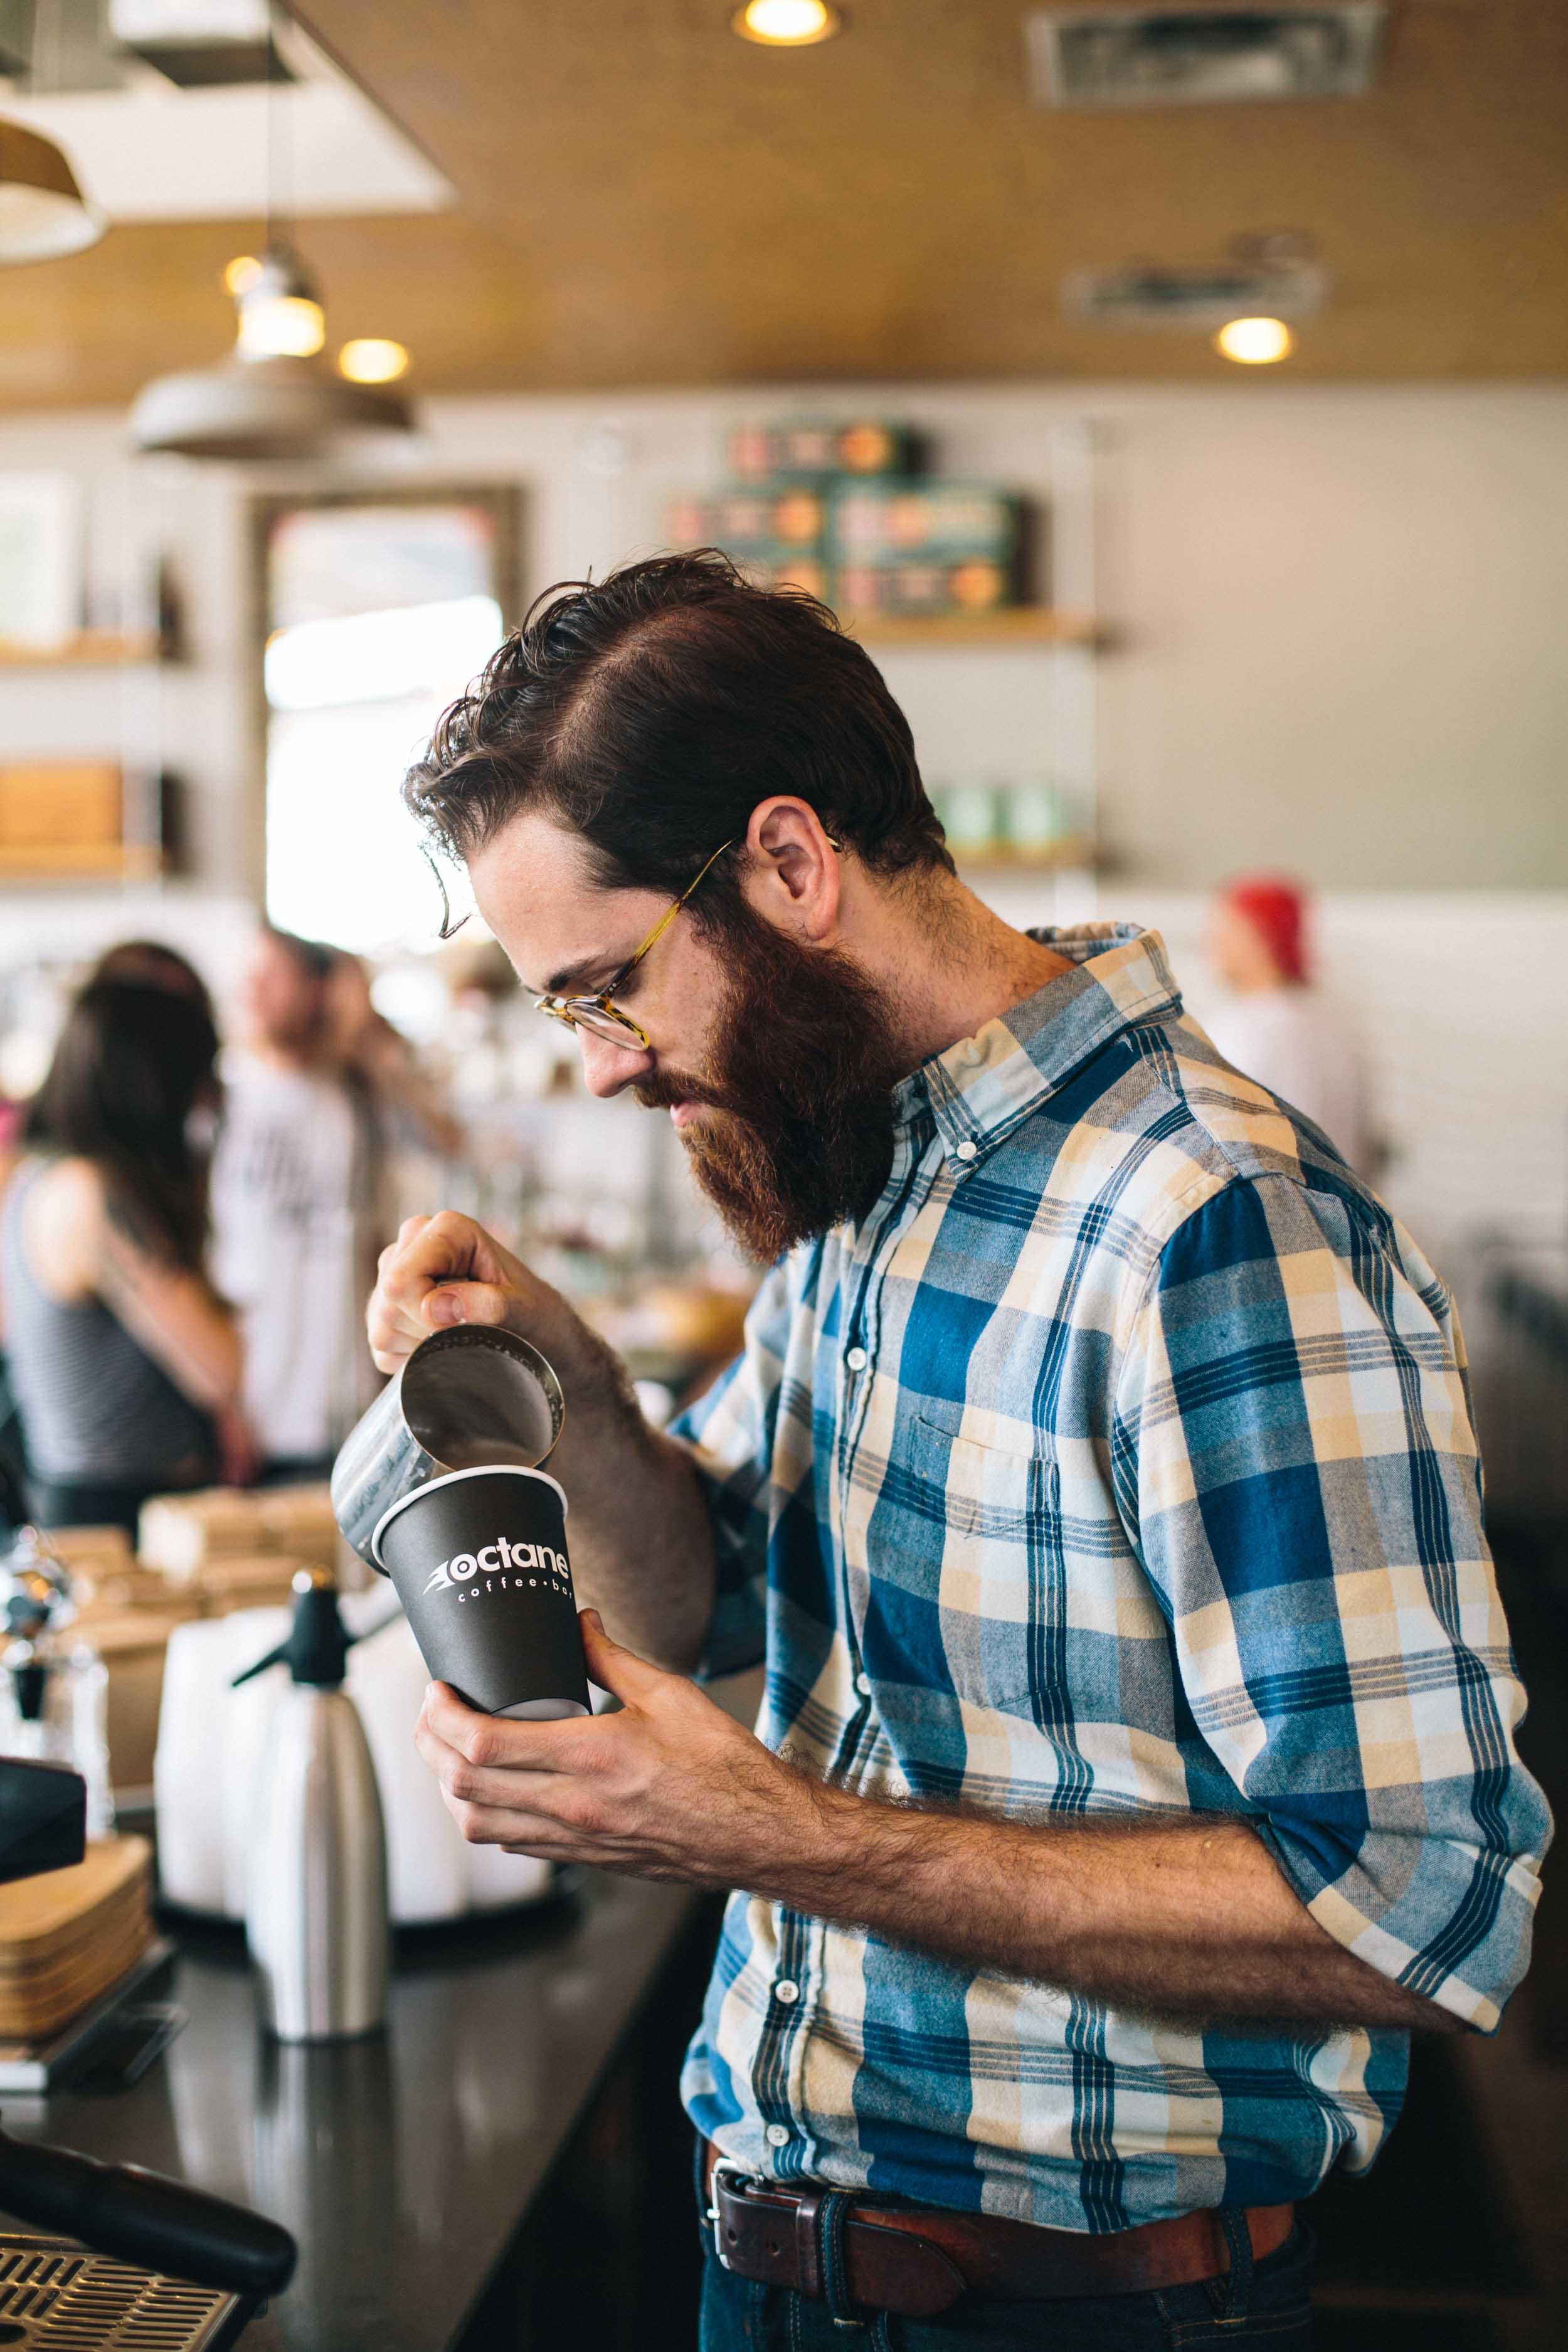 jimmy-rowalt-atlanta-coffee-food-drink-photography-036.jpg